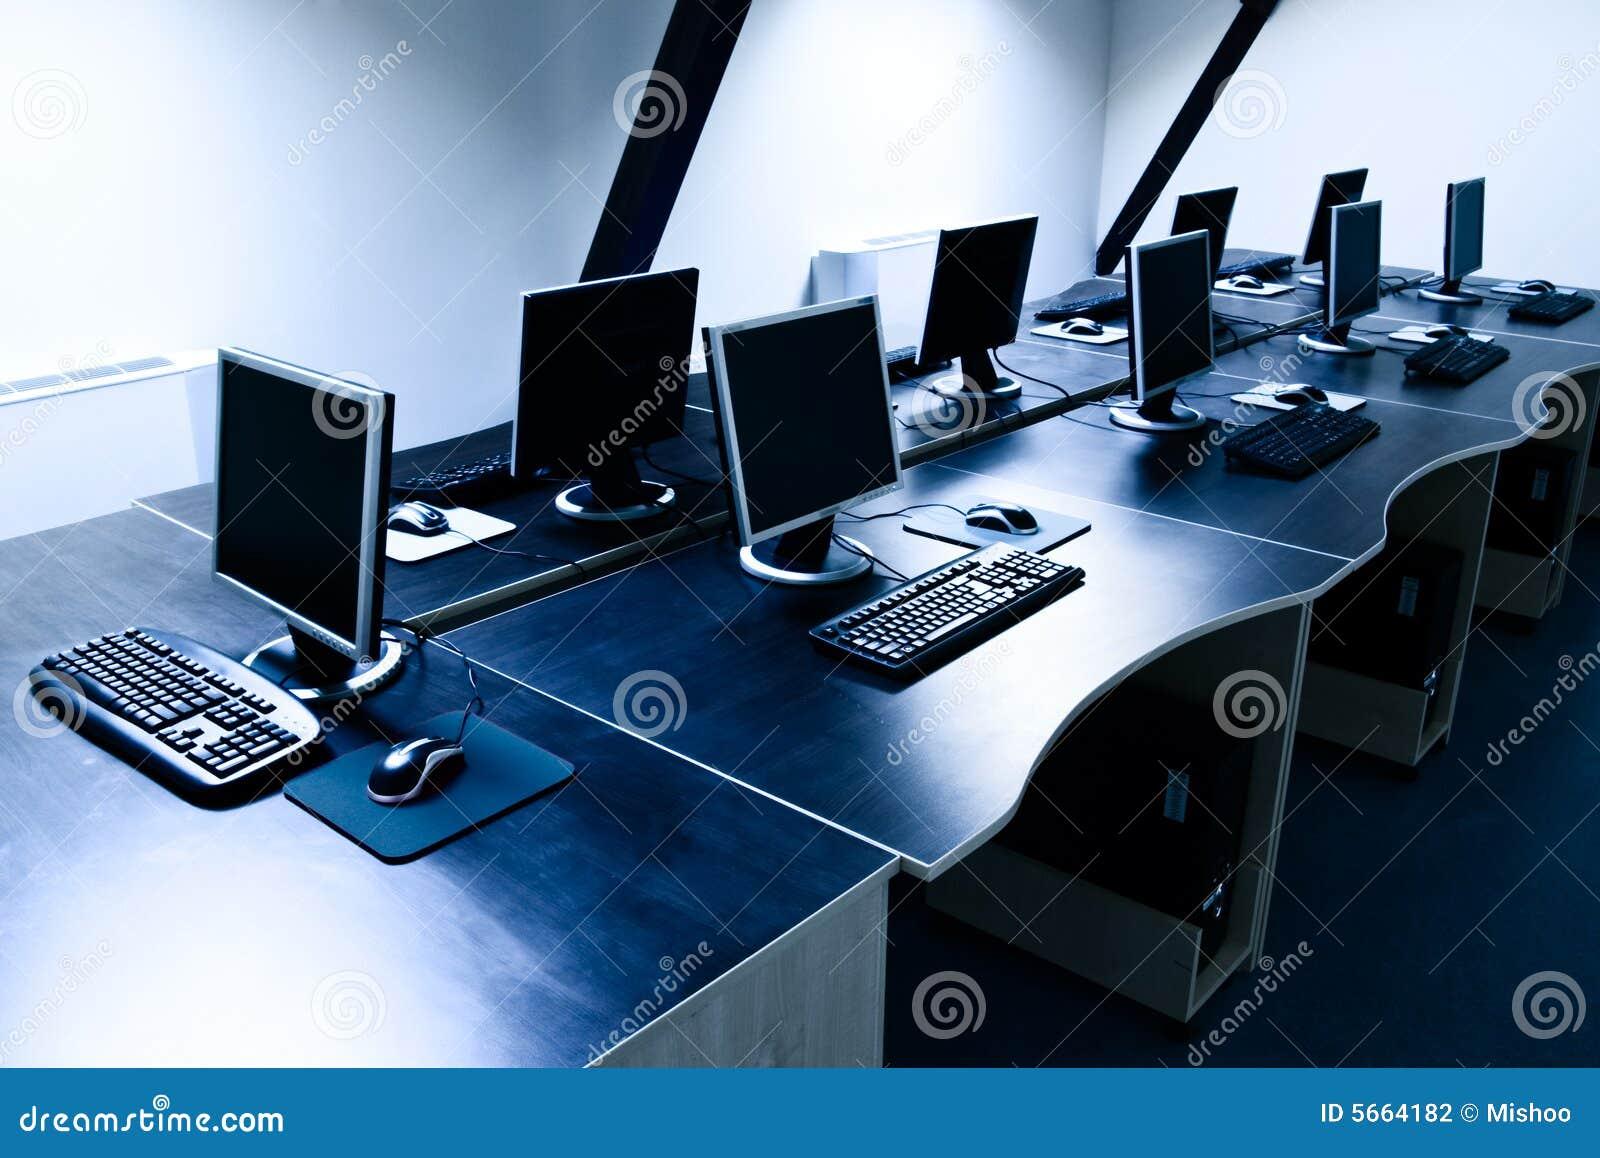 Computers room